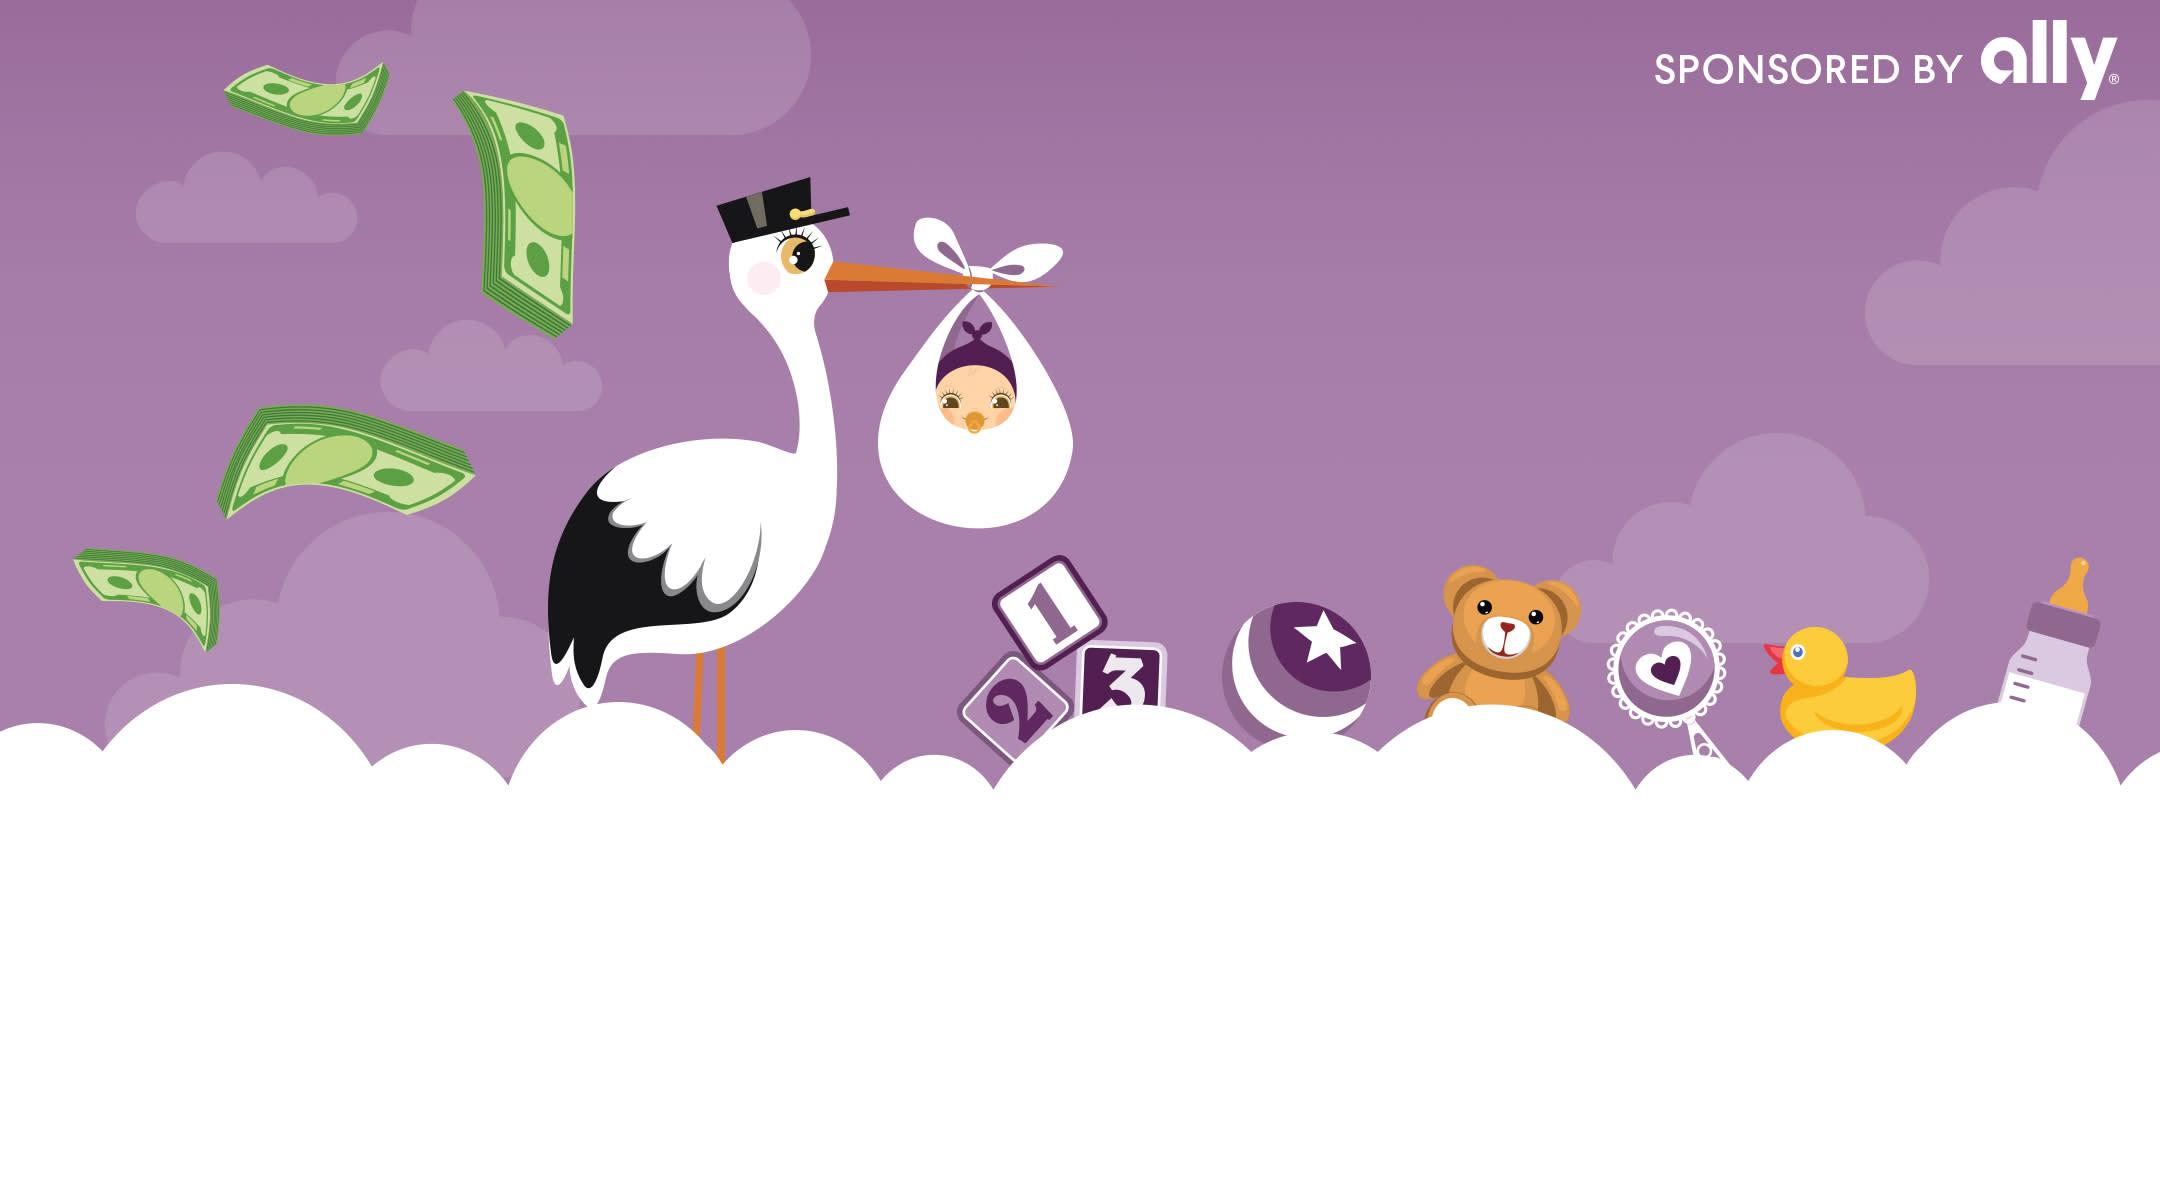 Stork graphic